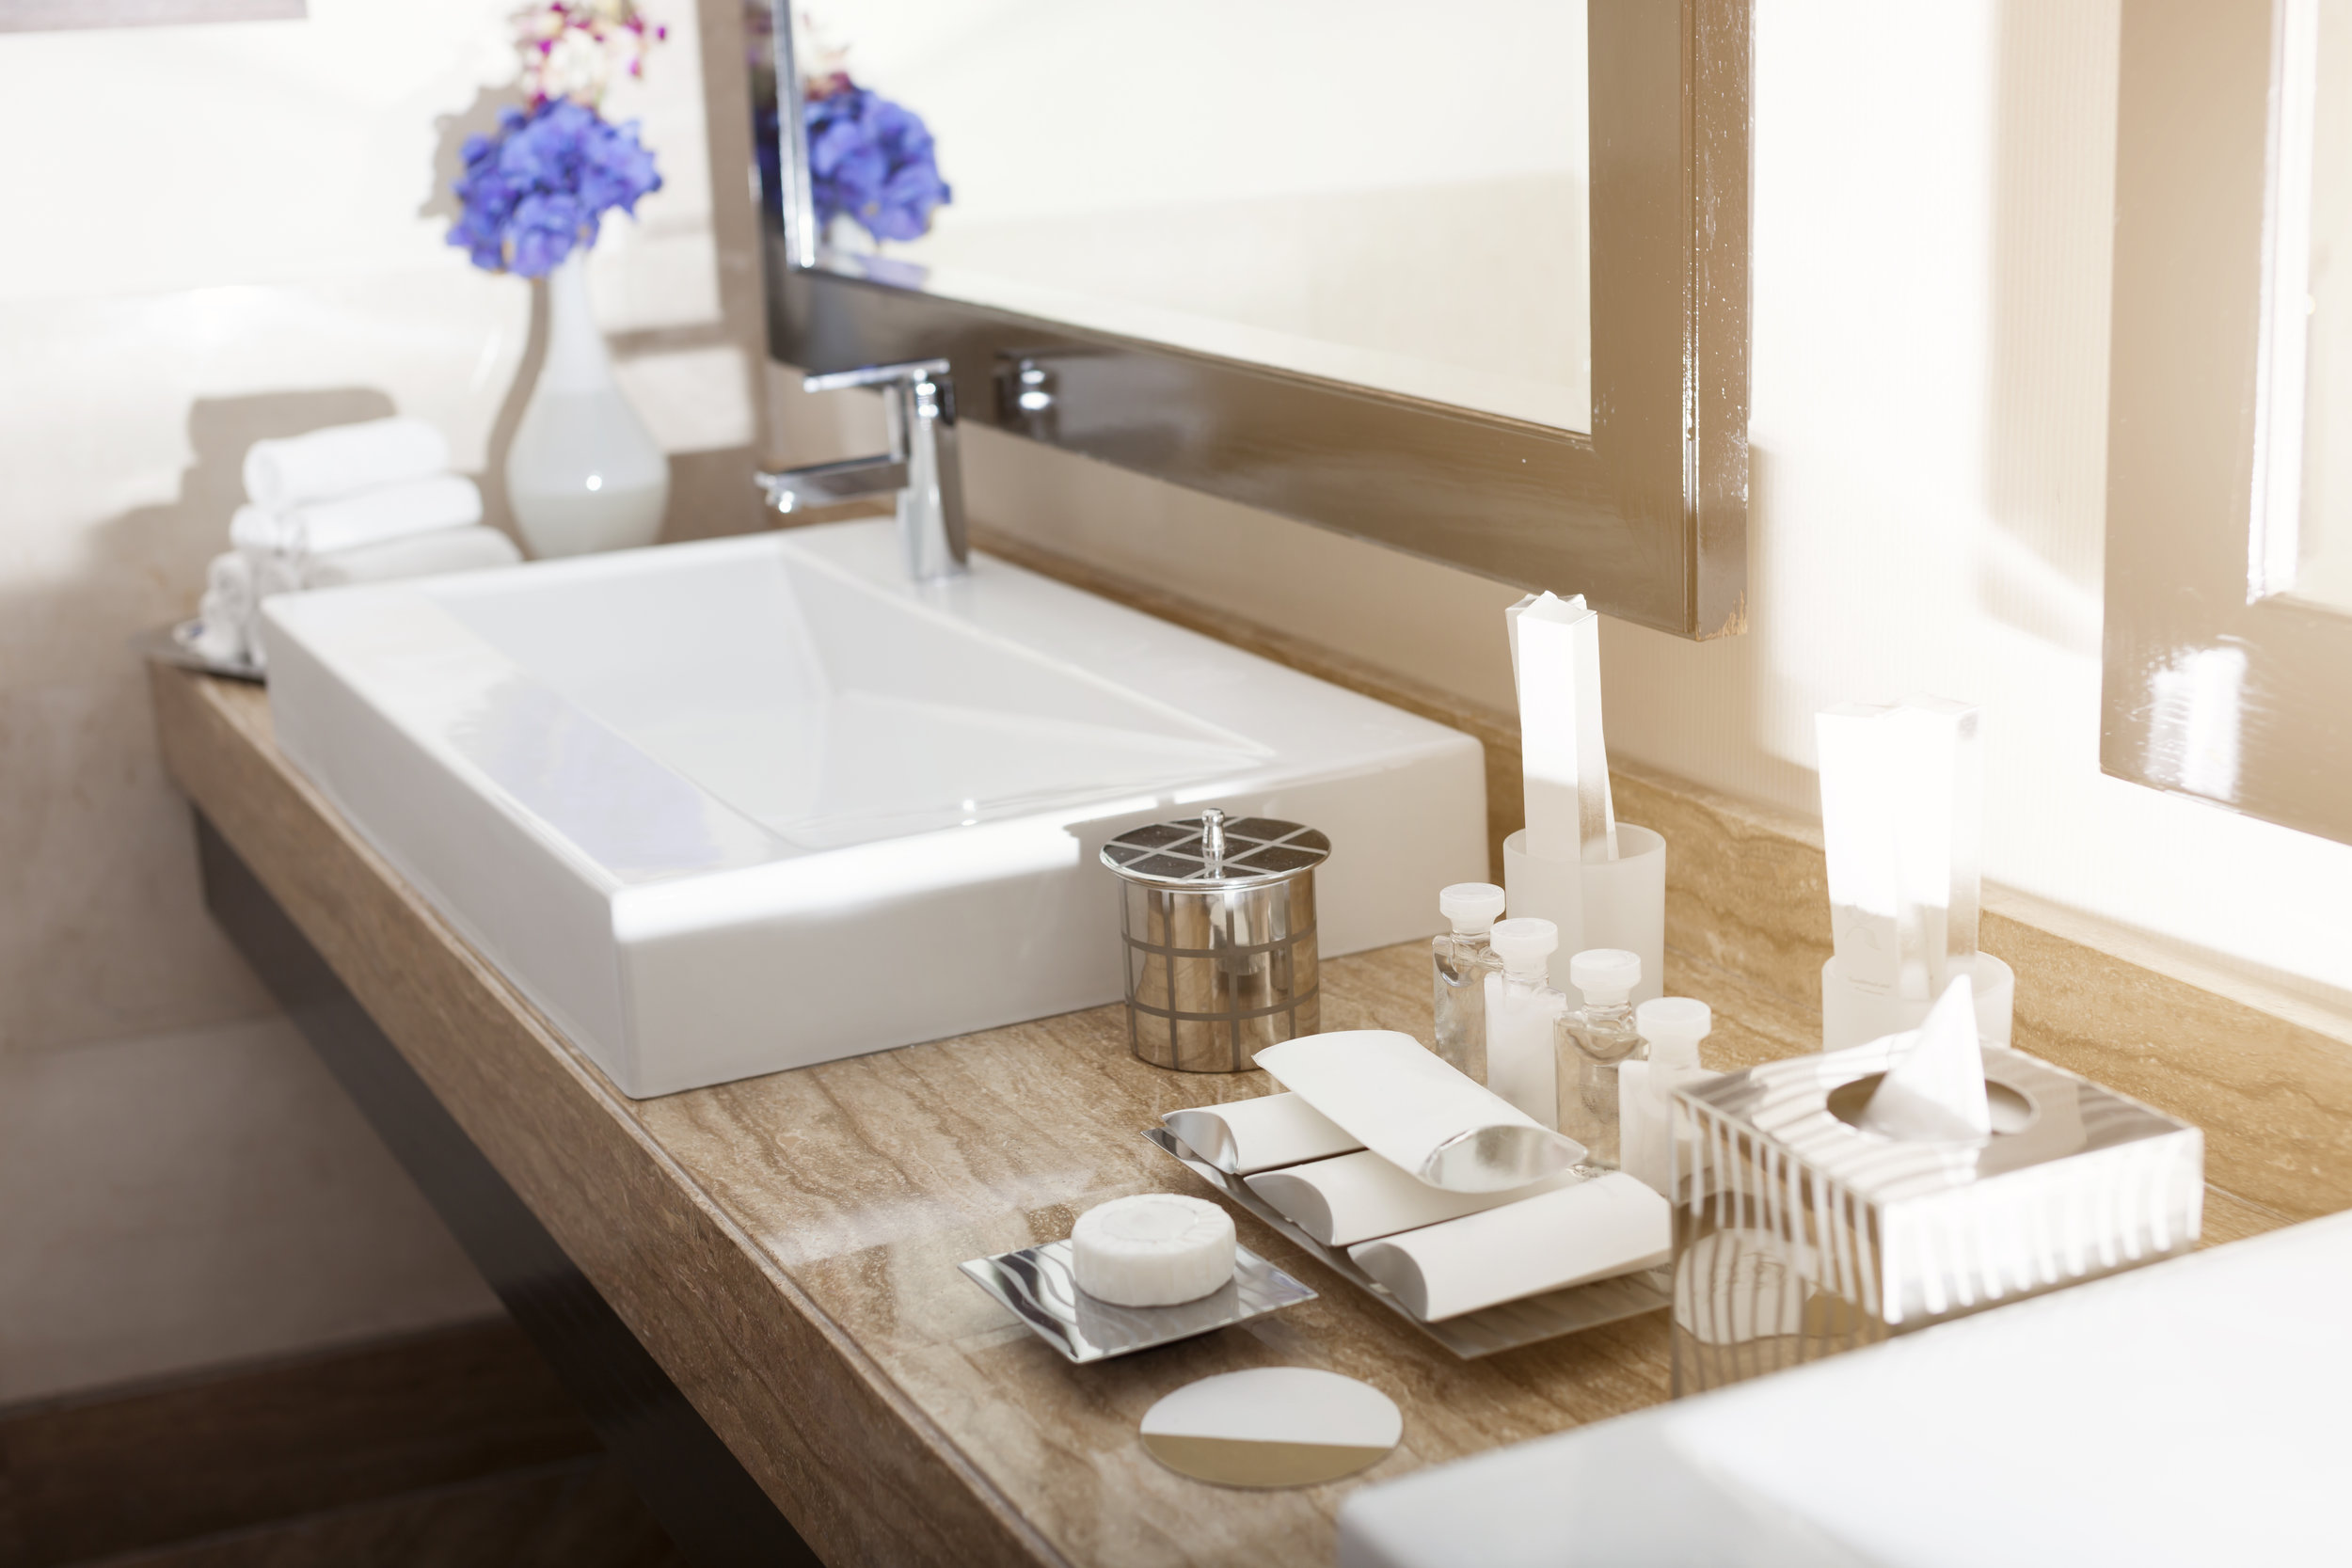 stock-photo-interior-of-a-modern-hotel-bathroom-559186708.jpg